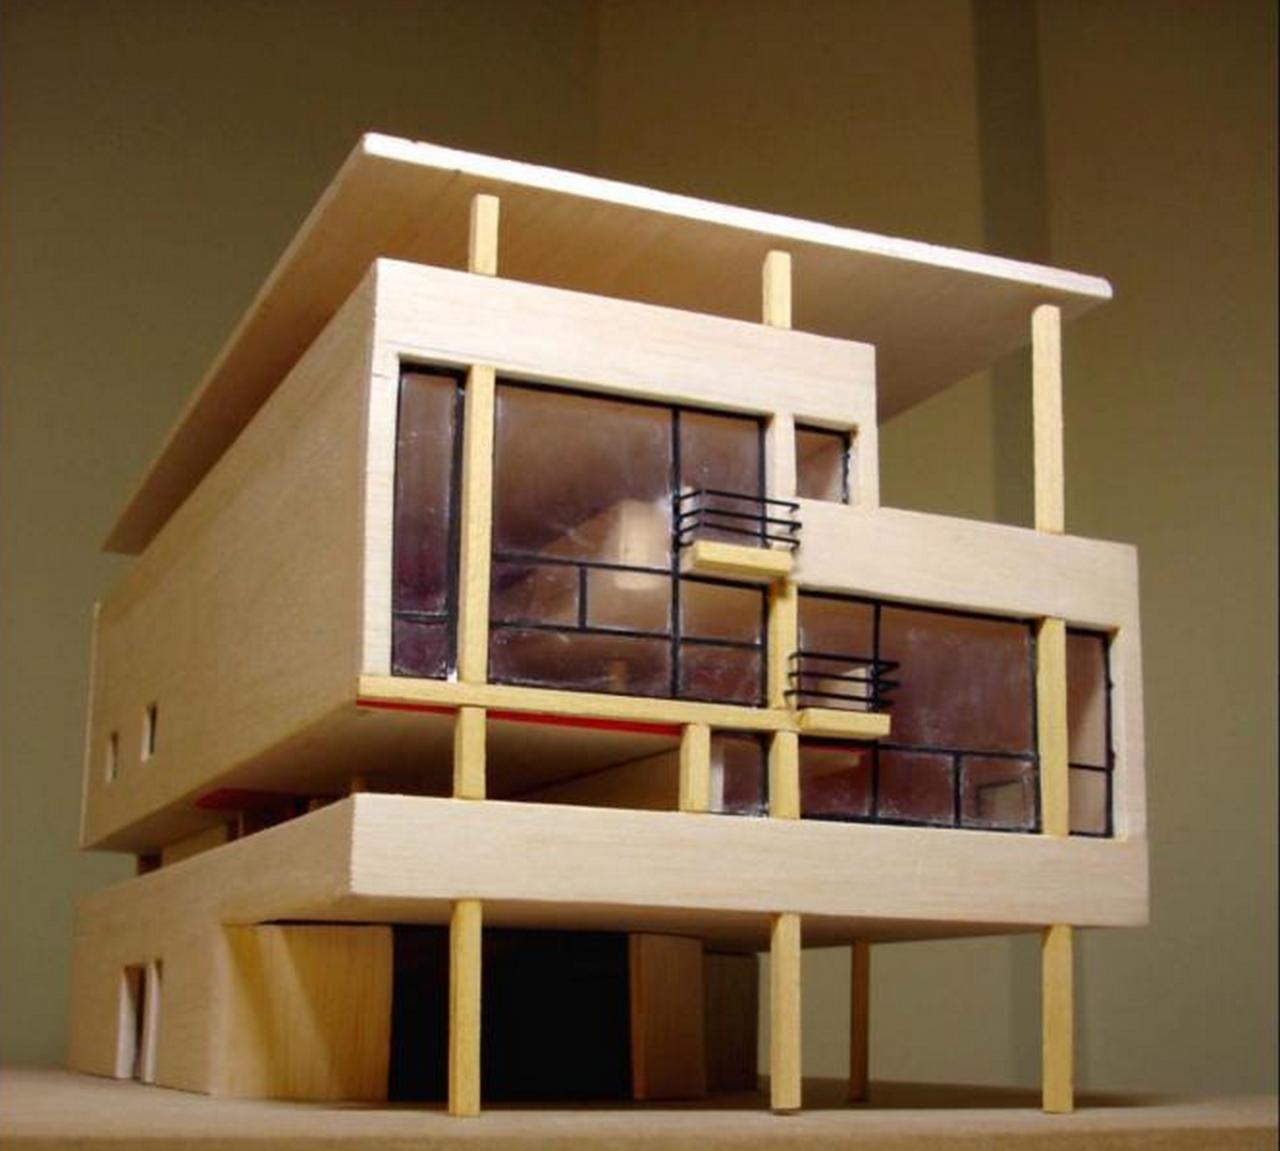 Villa baizeau corbusier architectural models pinterest for Model villa moderne